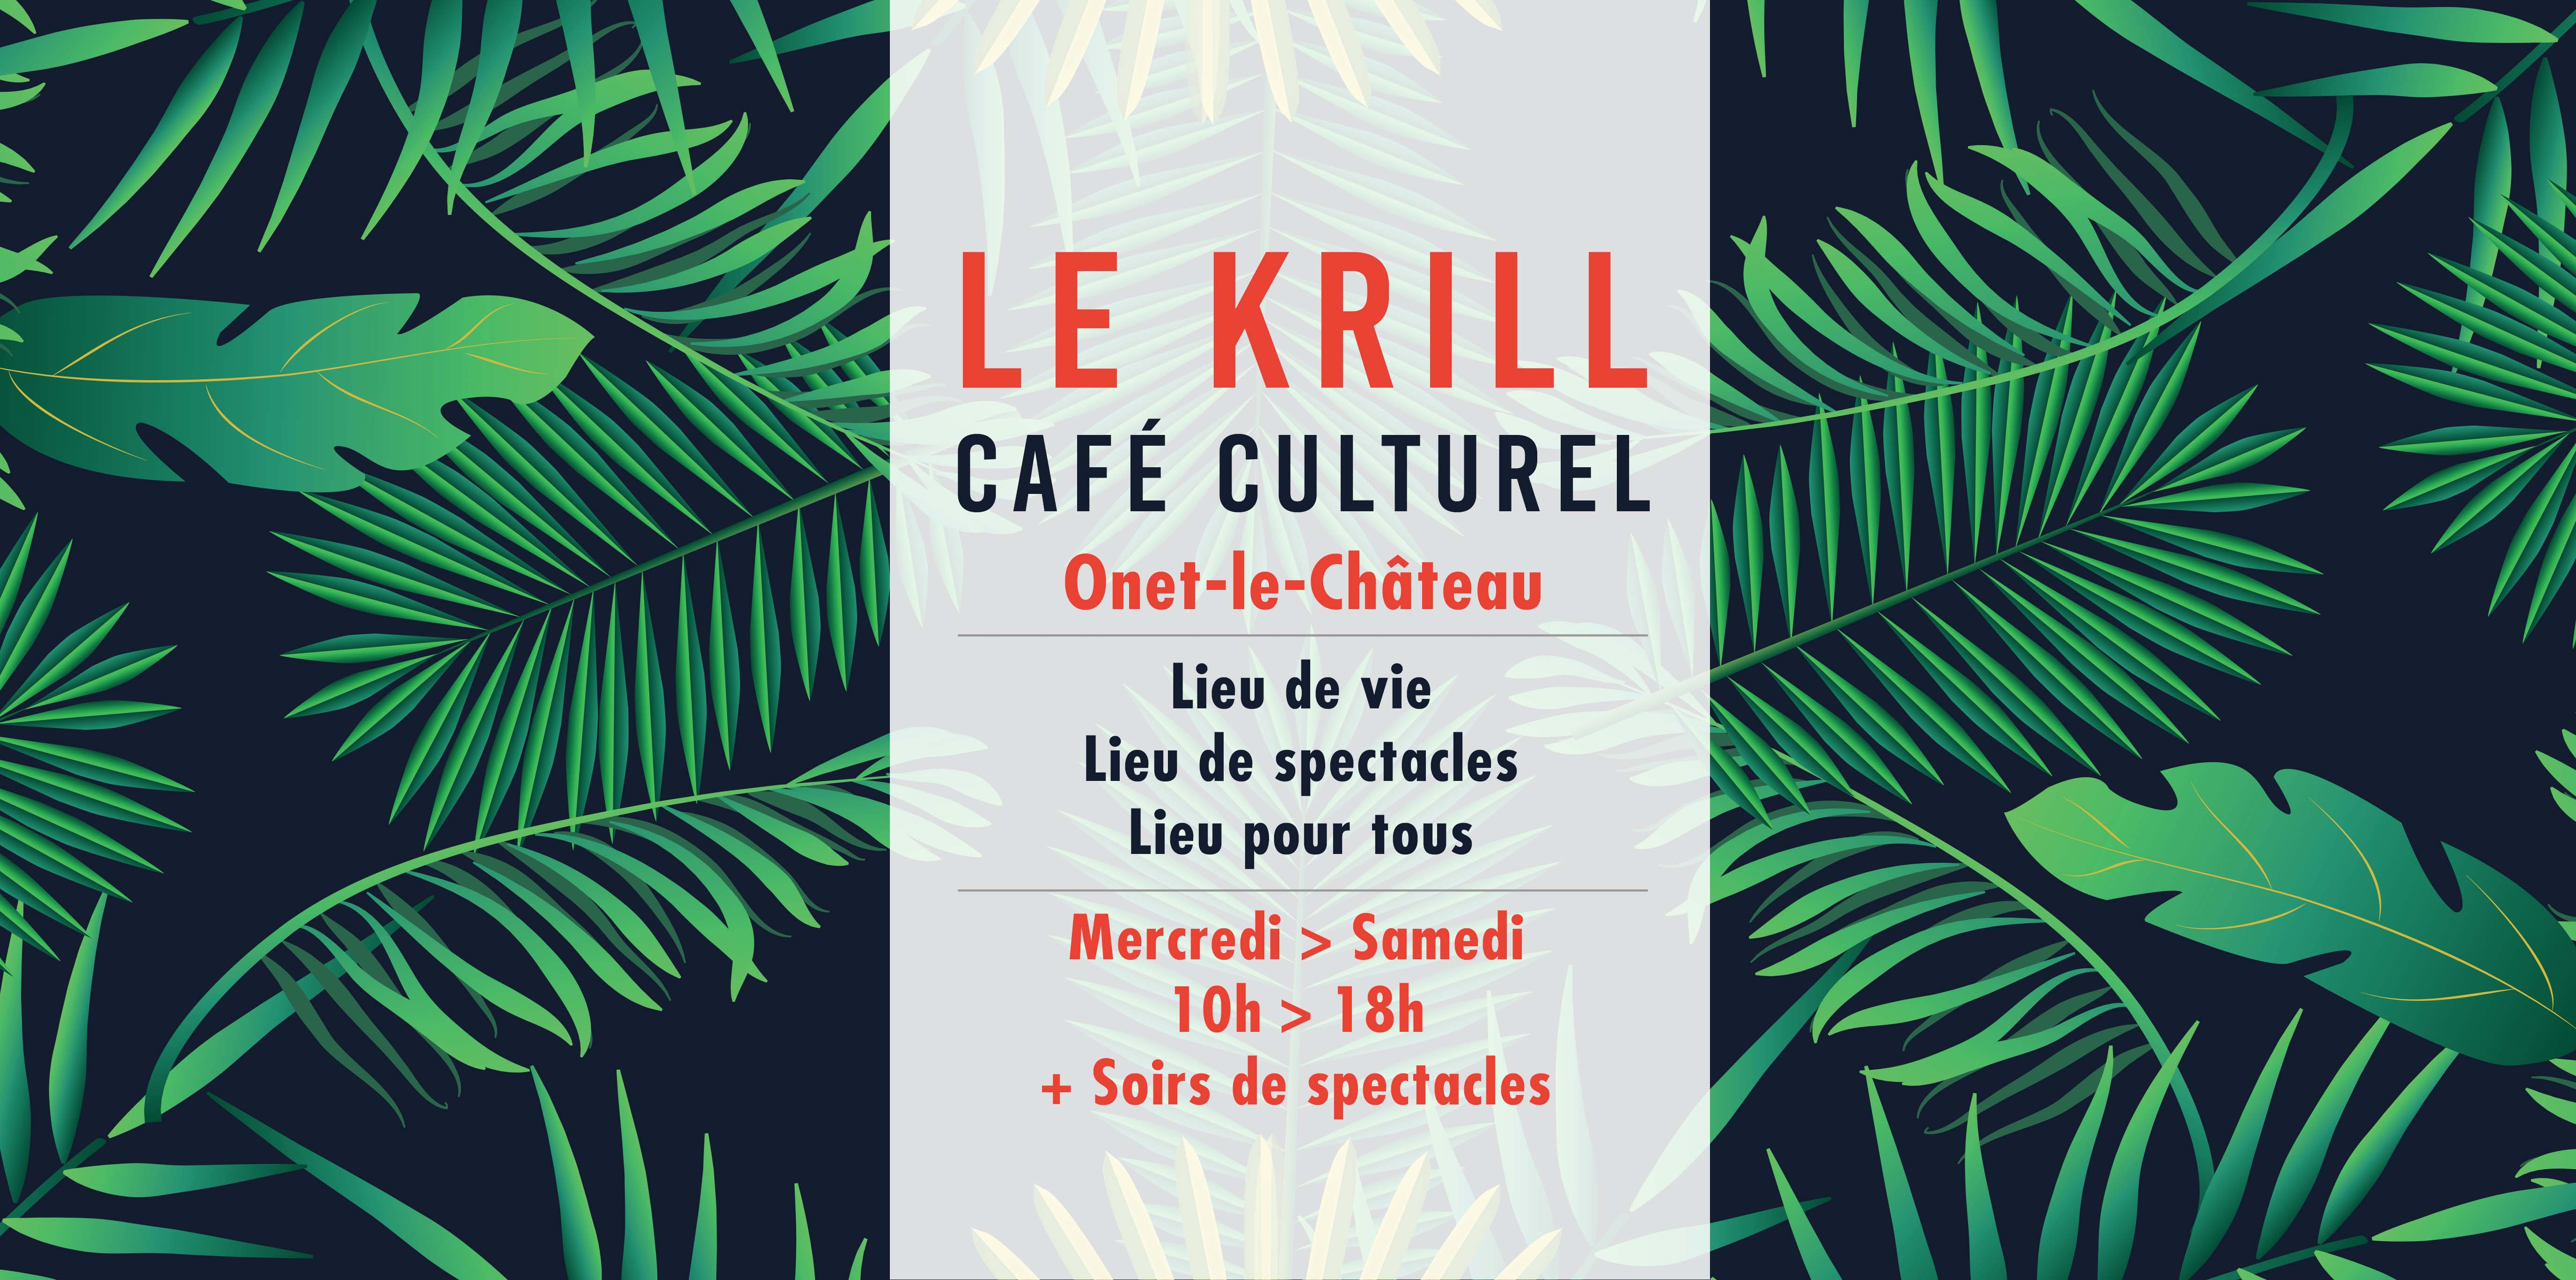 Le Krill Café culturel